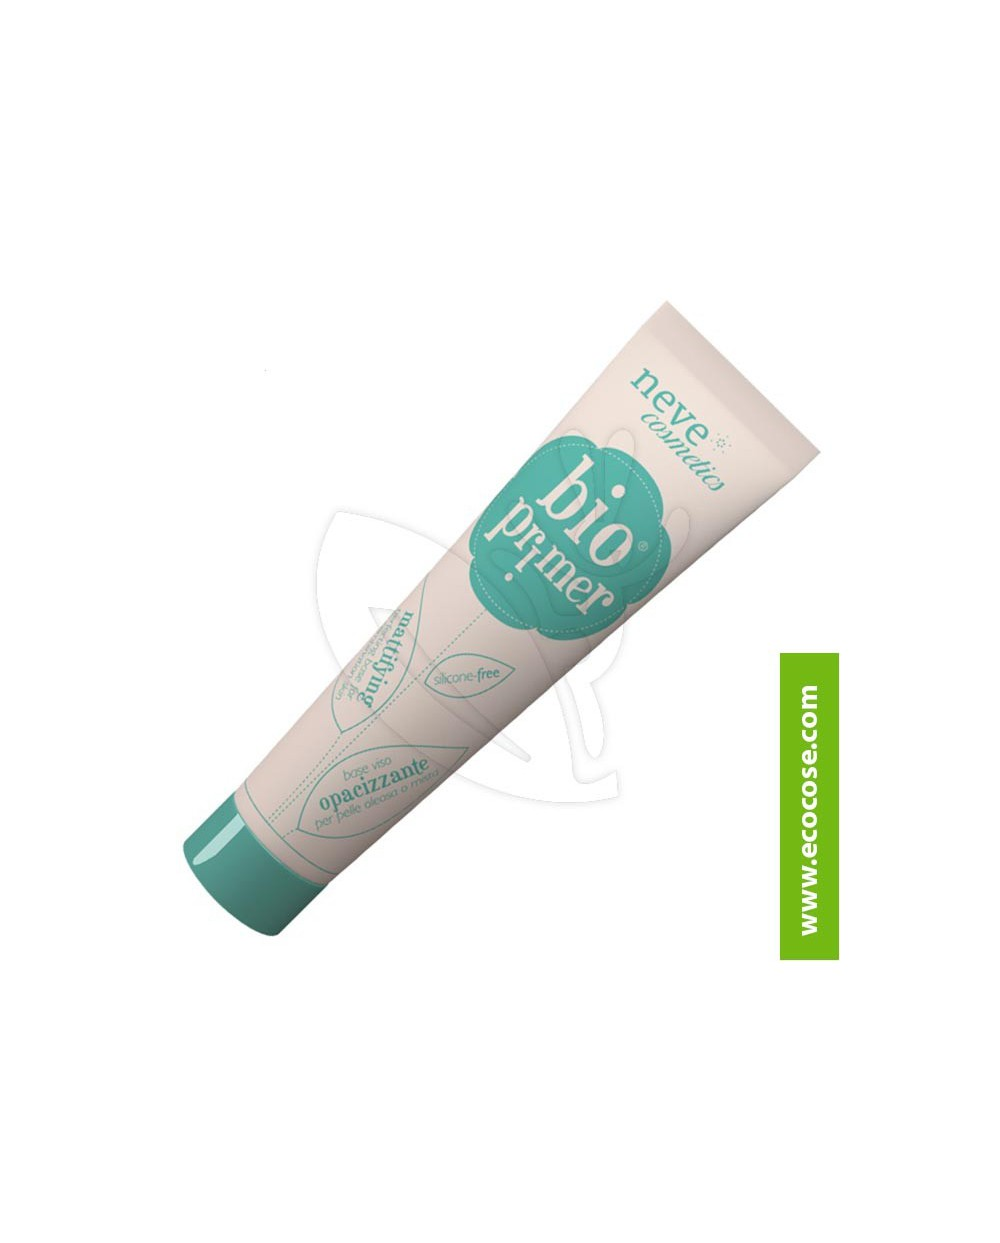 Neve Cosmetics - BioPrimer Mattifying - pelle grassa-mista